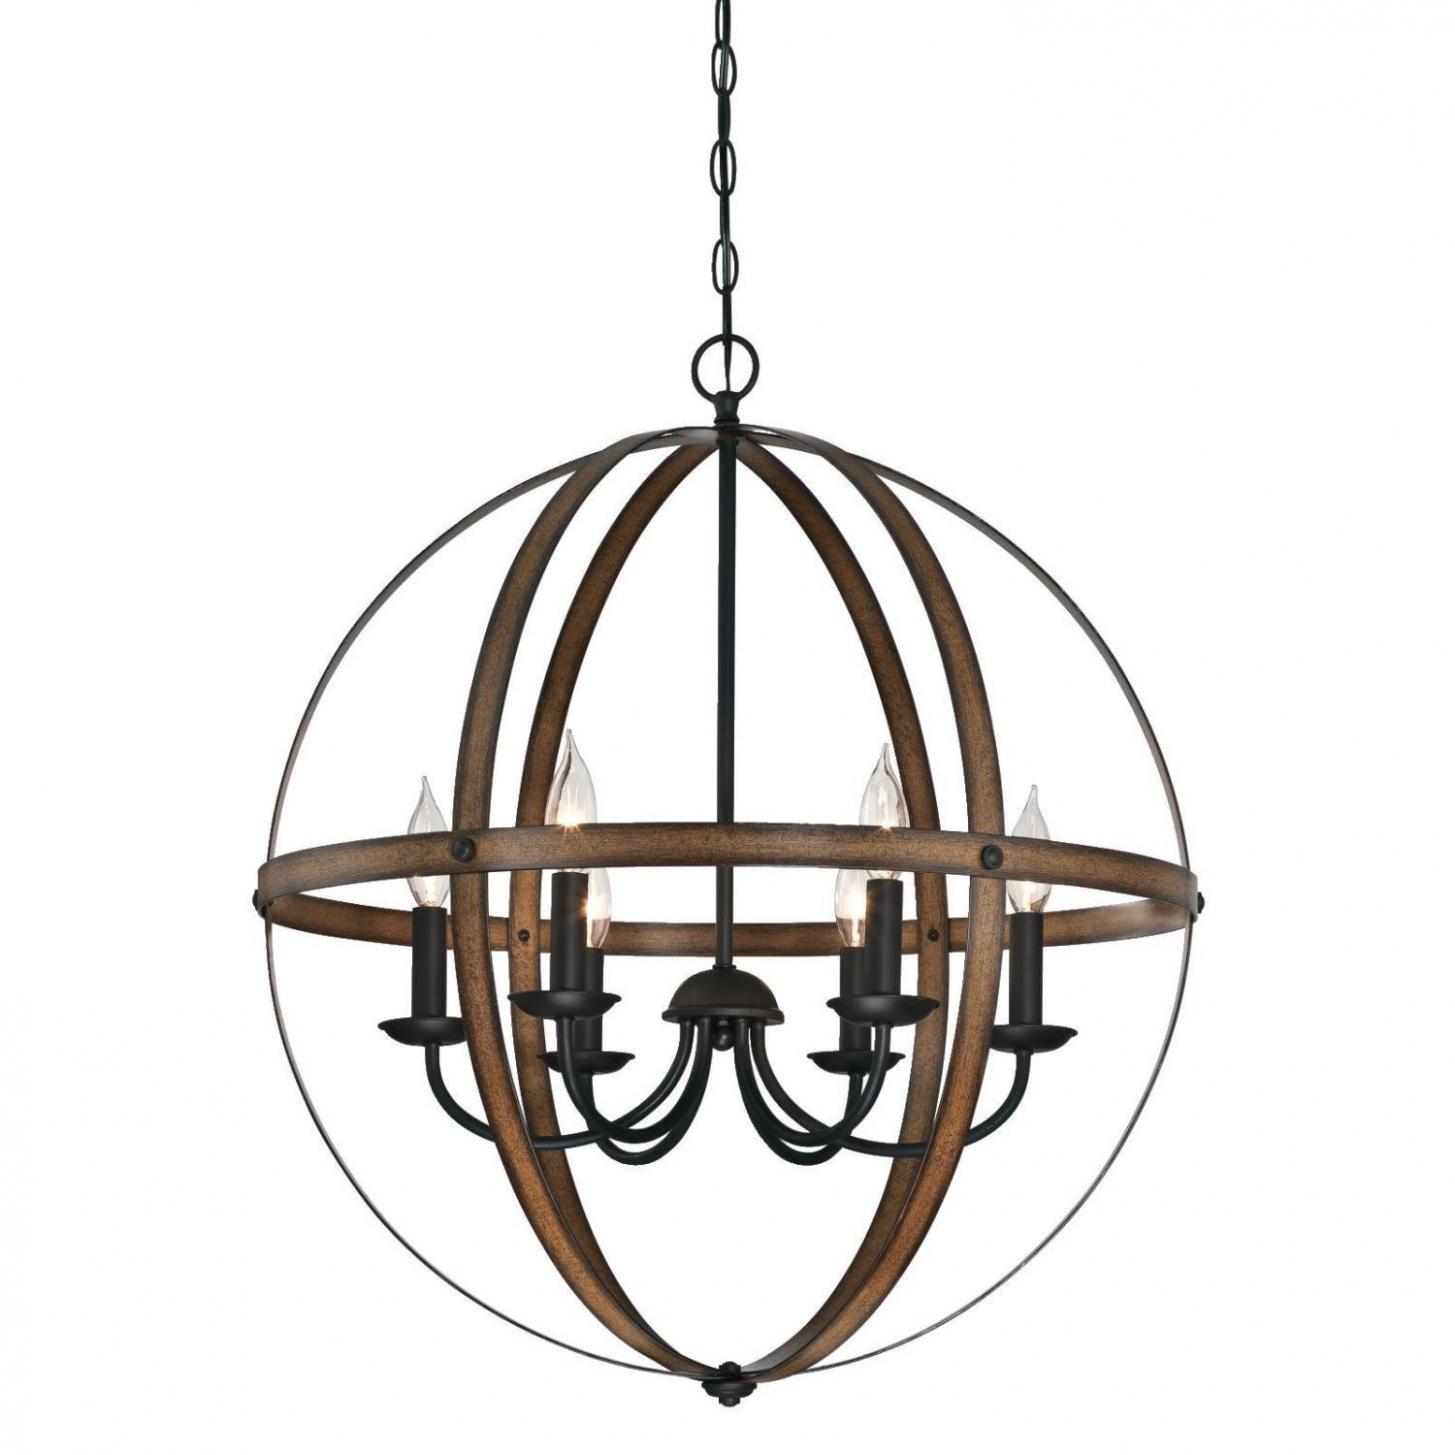 Lighting. Endearing Globe Chandelier Lighting Your Home regarding Shipststour 3-Light Globe Chandeliers (Image 22 of 30)